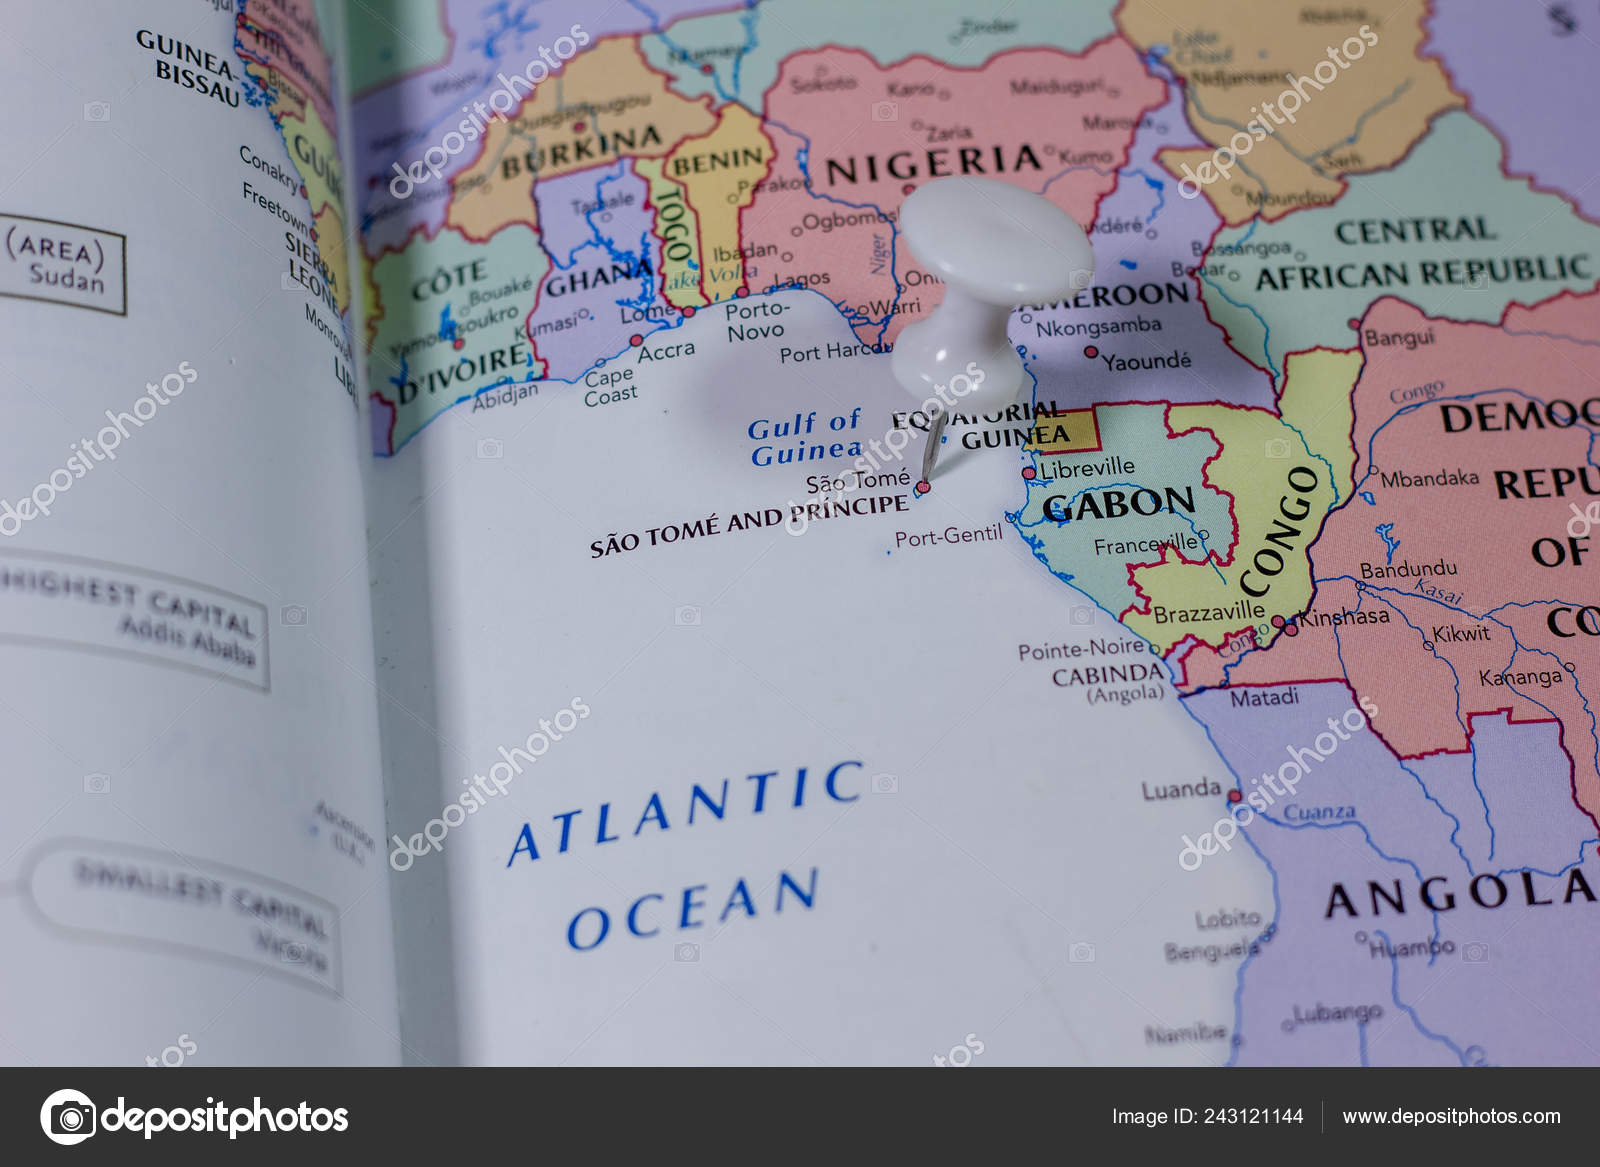 Ivanovsk Russia February 2019 Sao Tome Principe Map World ... on saudi arabia world map, mauritania world map, laos world map, liberia world map, japan world map, botswana world map, portugal world map, angola world map, switzerland world map, congo world map, norway world map, guantanamo bay world map, burundi world map, peru world map, bangladesh world map, denmark world map, tonga world map, brazil world map, france world map, n korea world map,